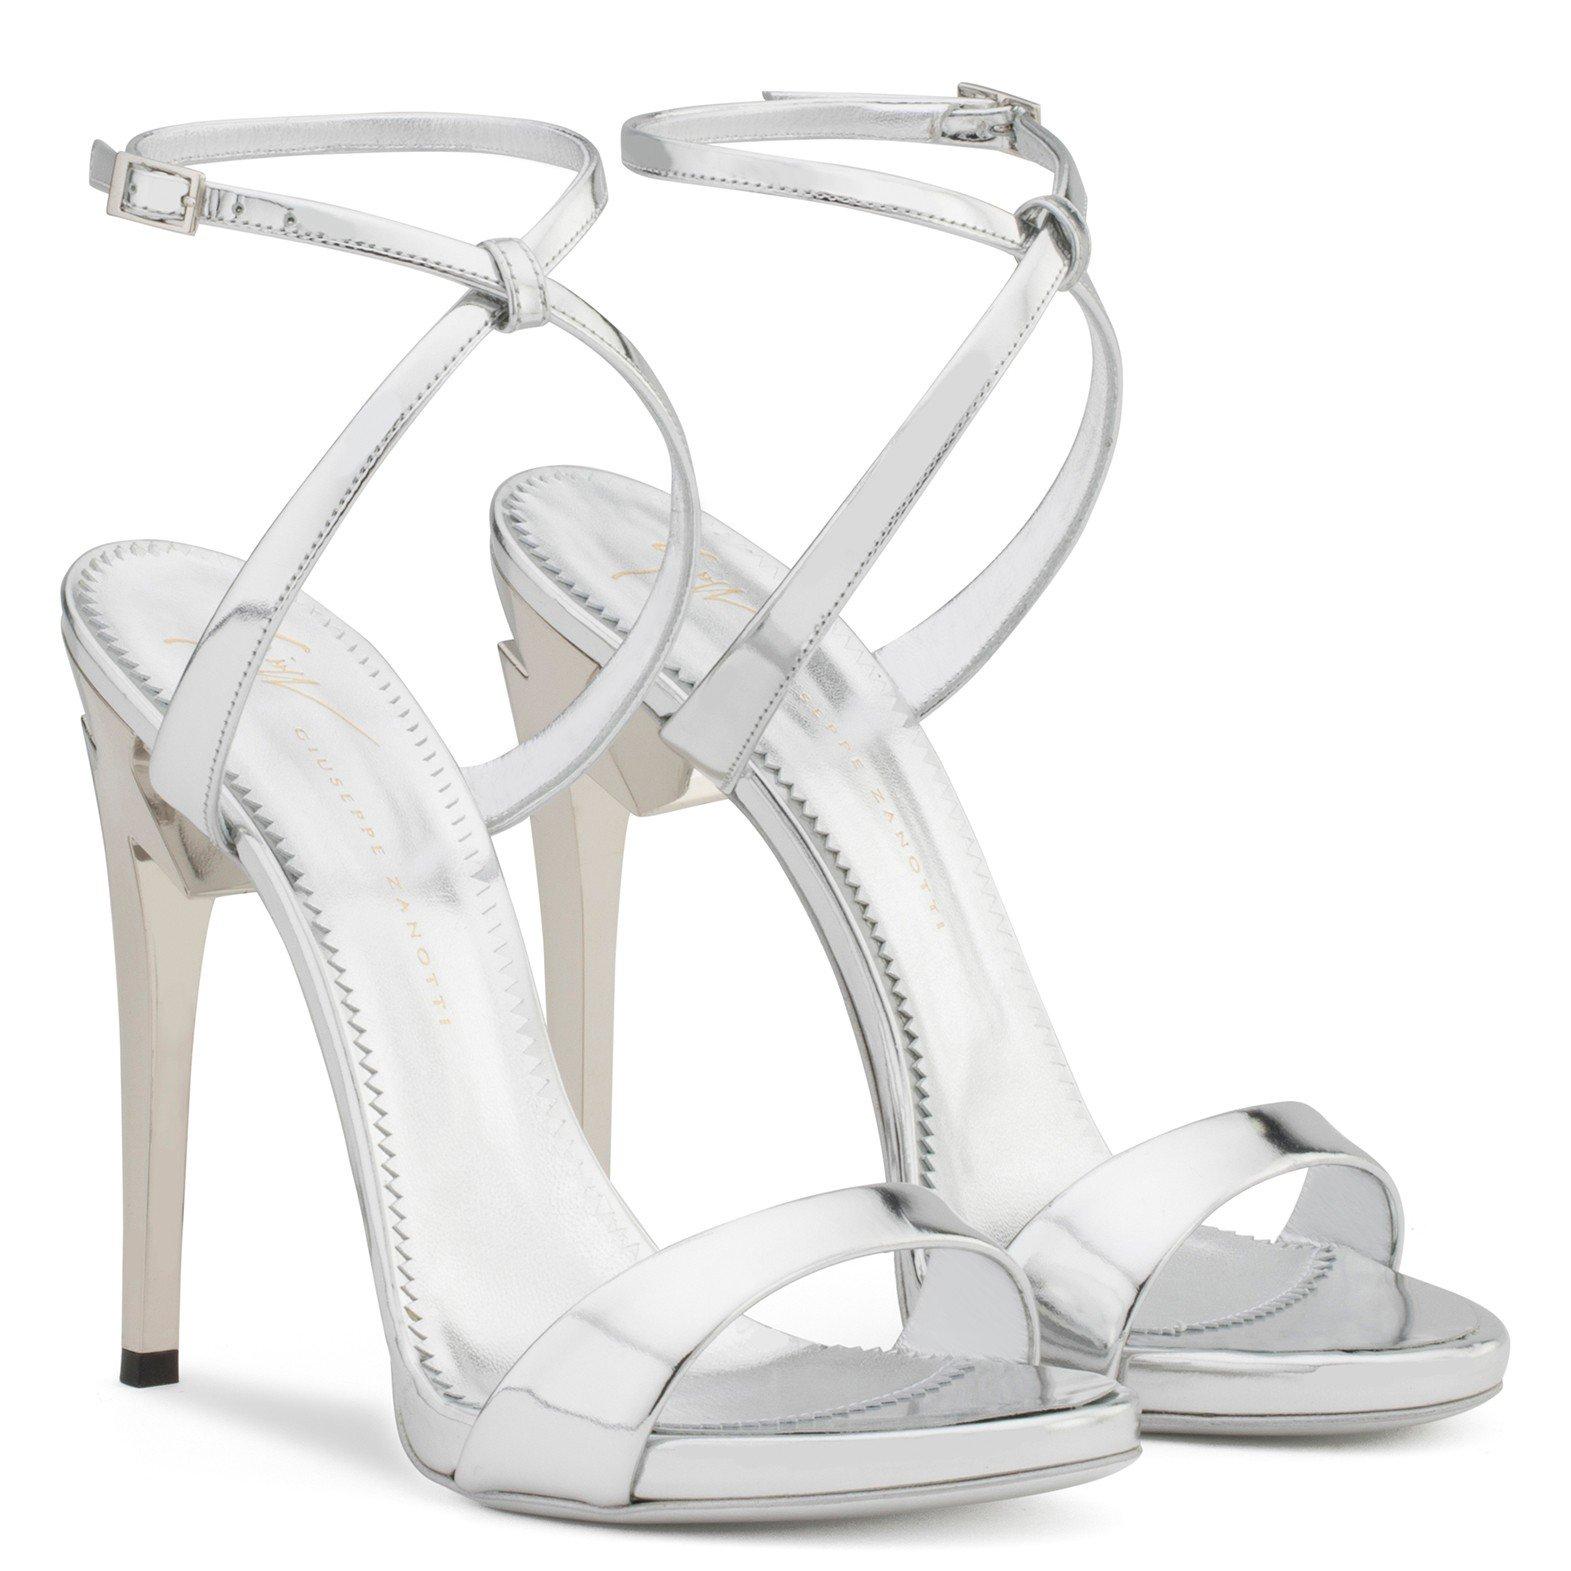 G-Heel - Sandals - Silver | Giuseppe Zanotti - US